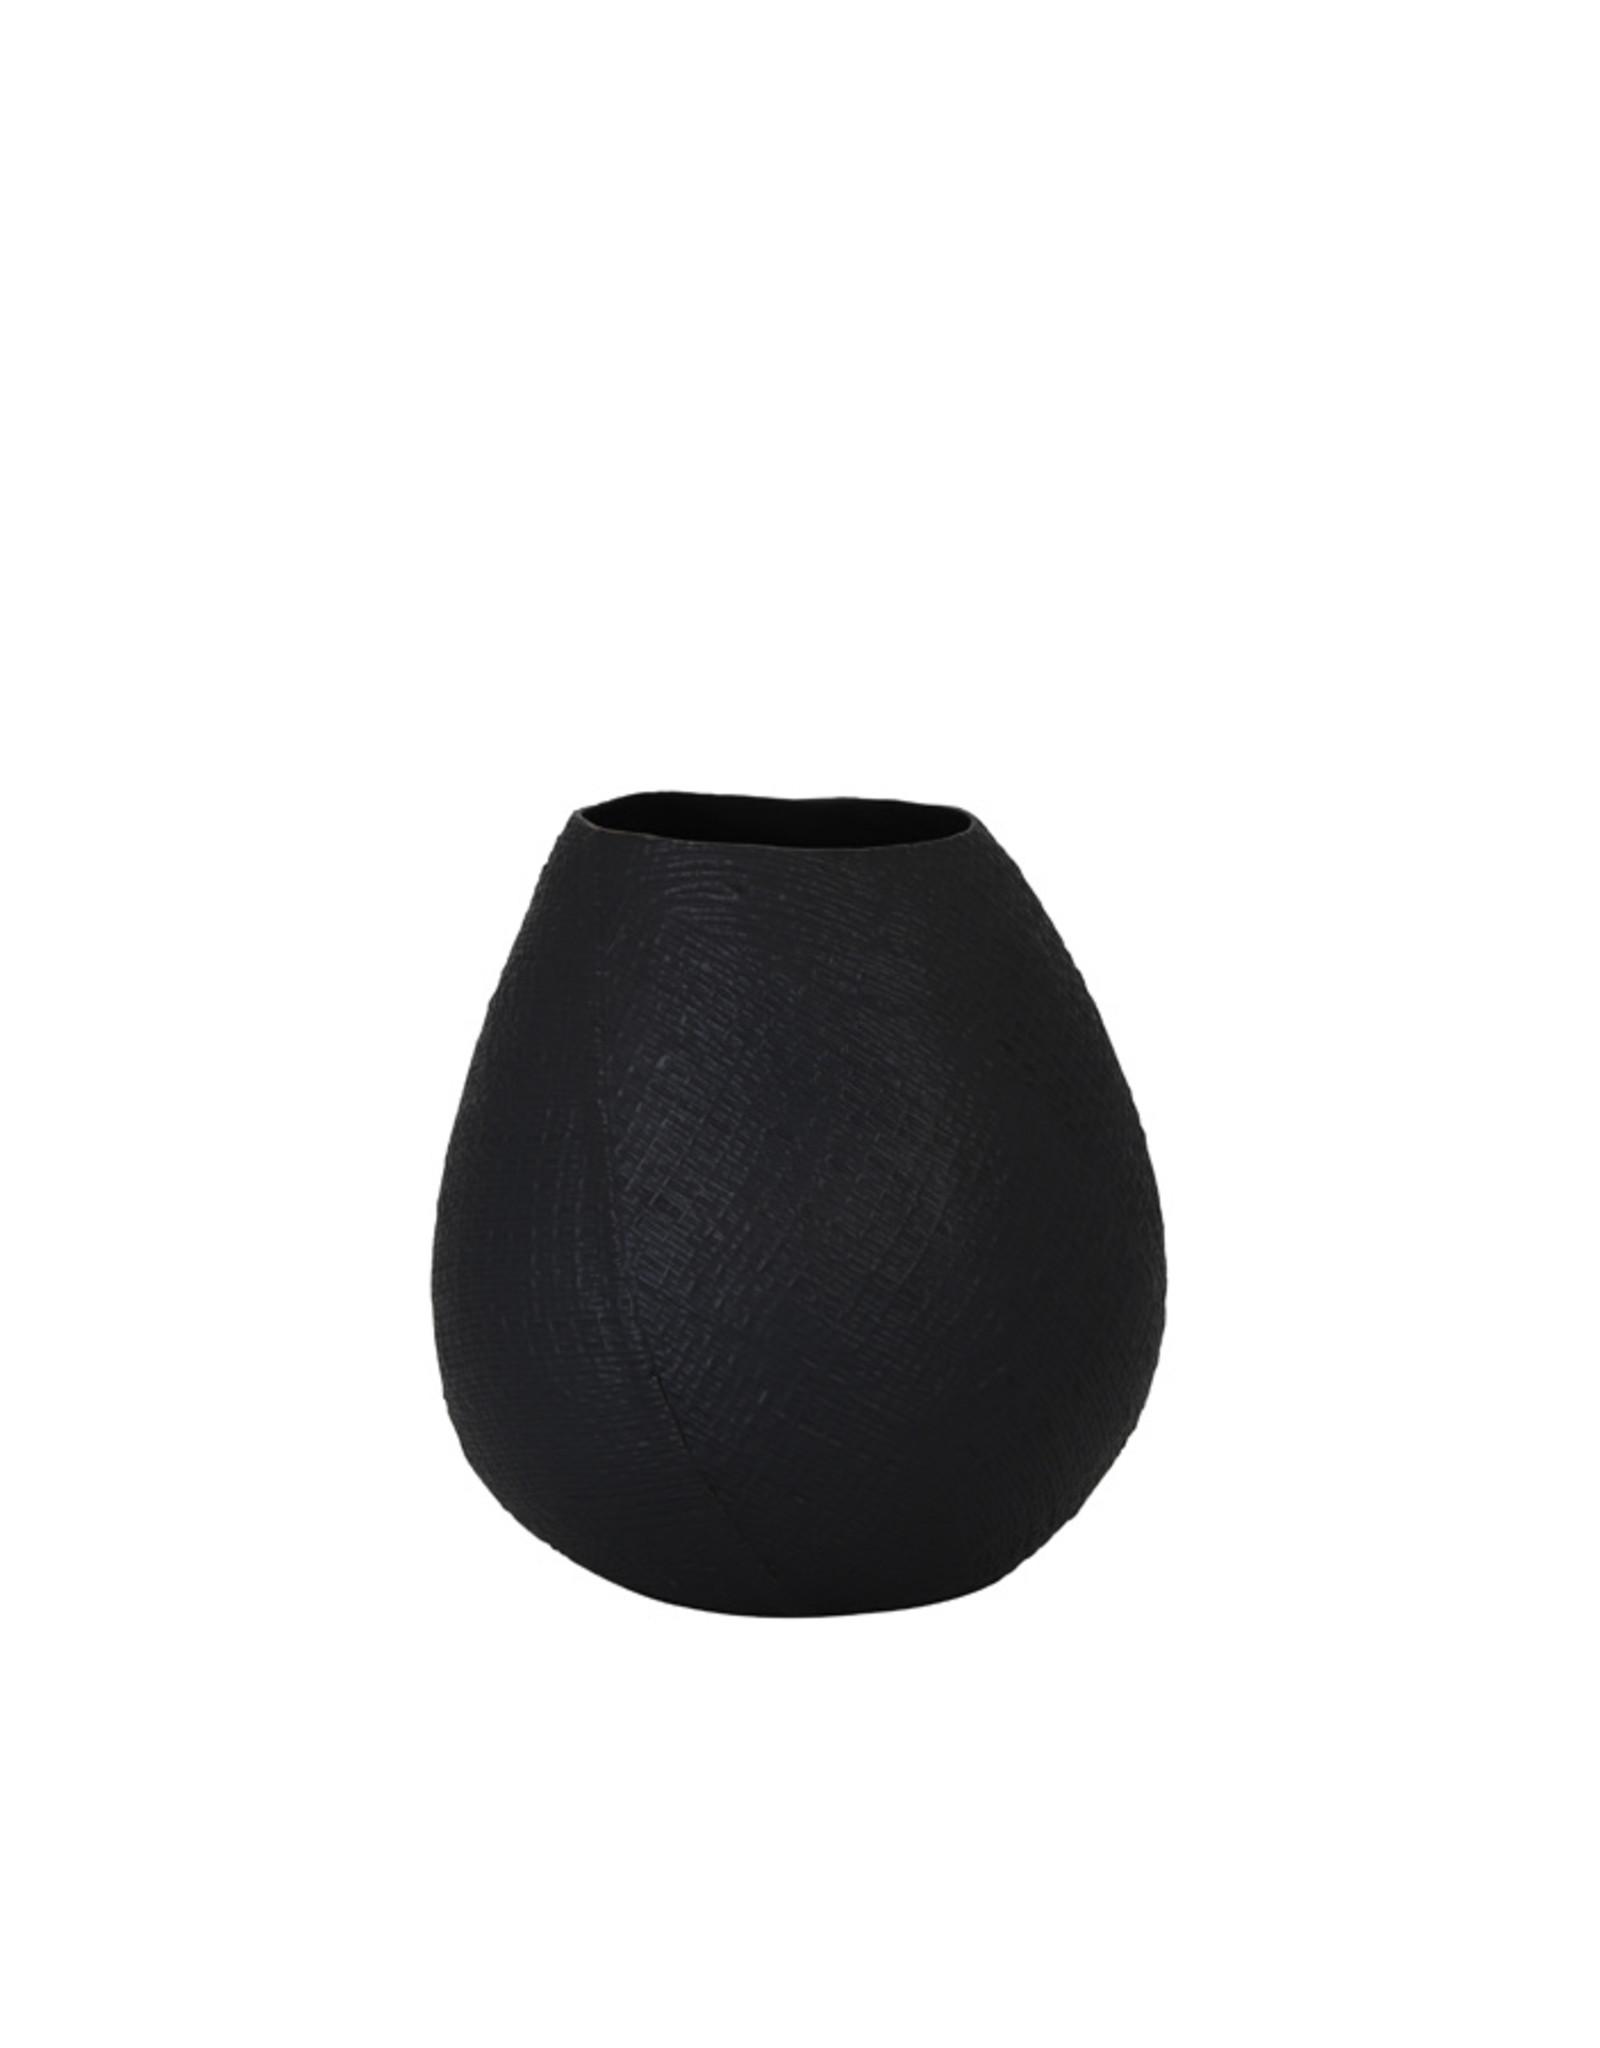 Vaas keramiek mat zwart